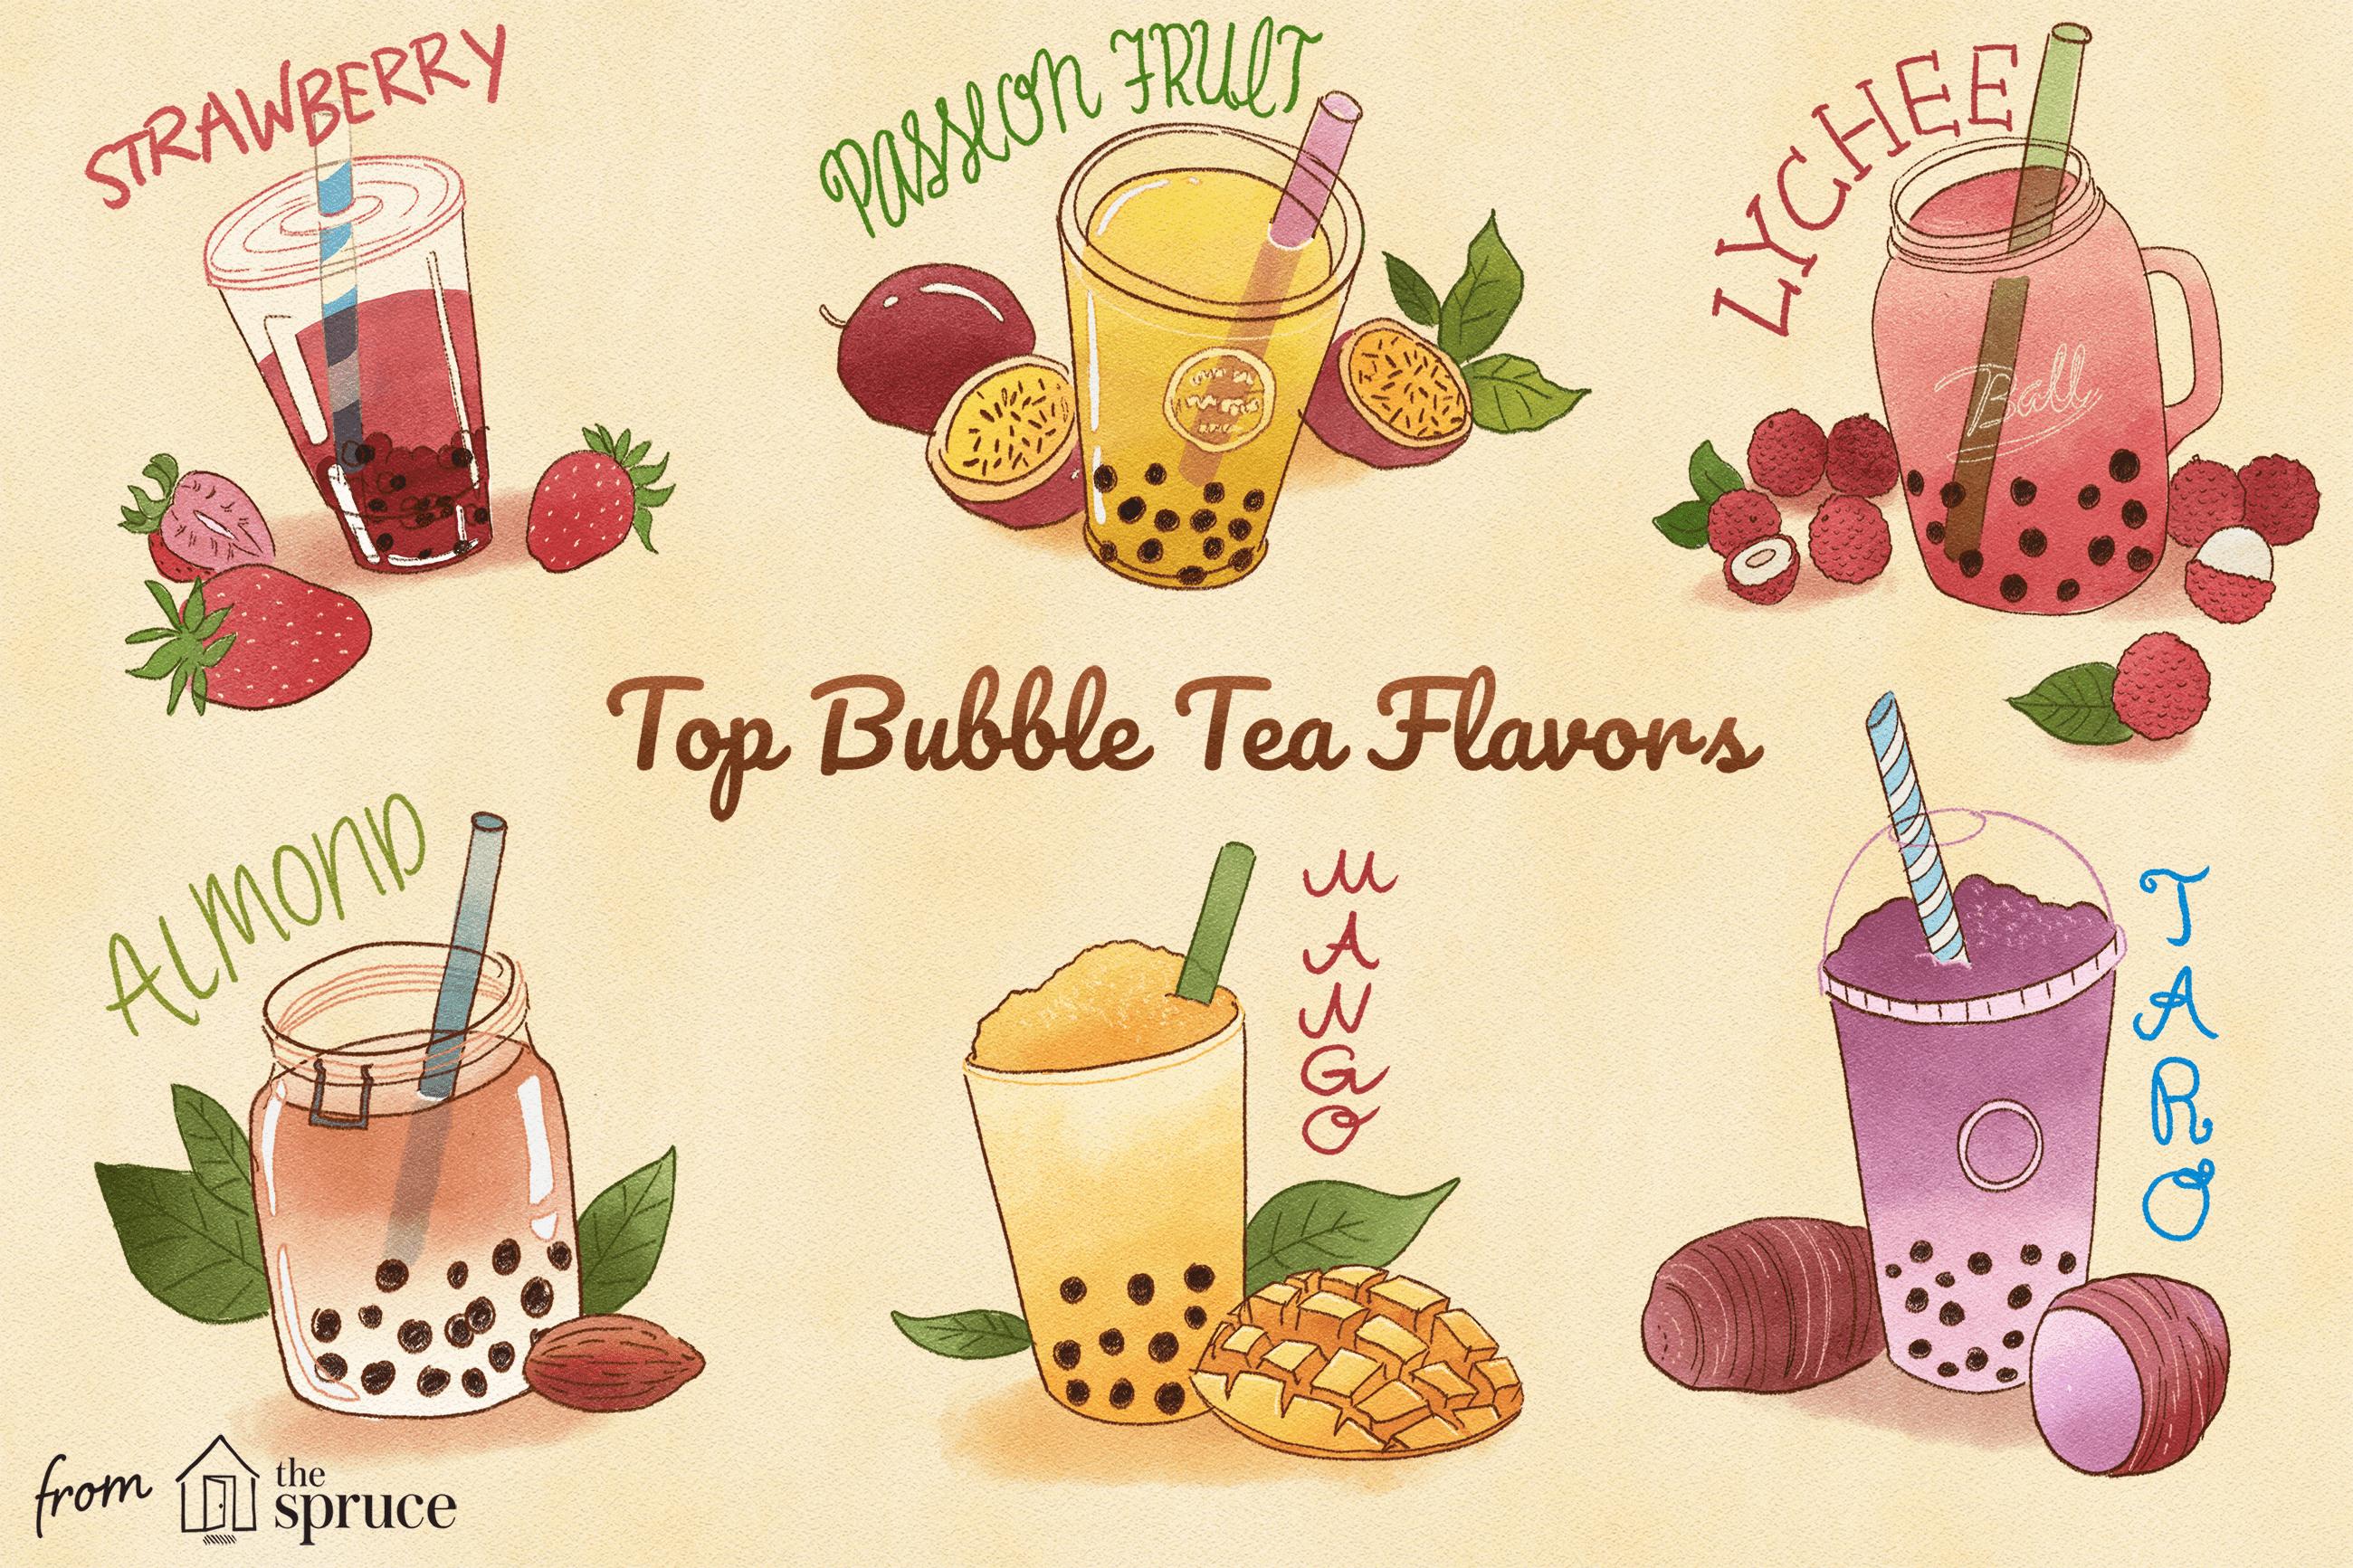 Types of Tea in Bubble Tea